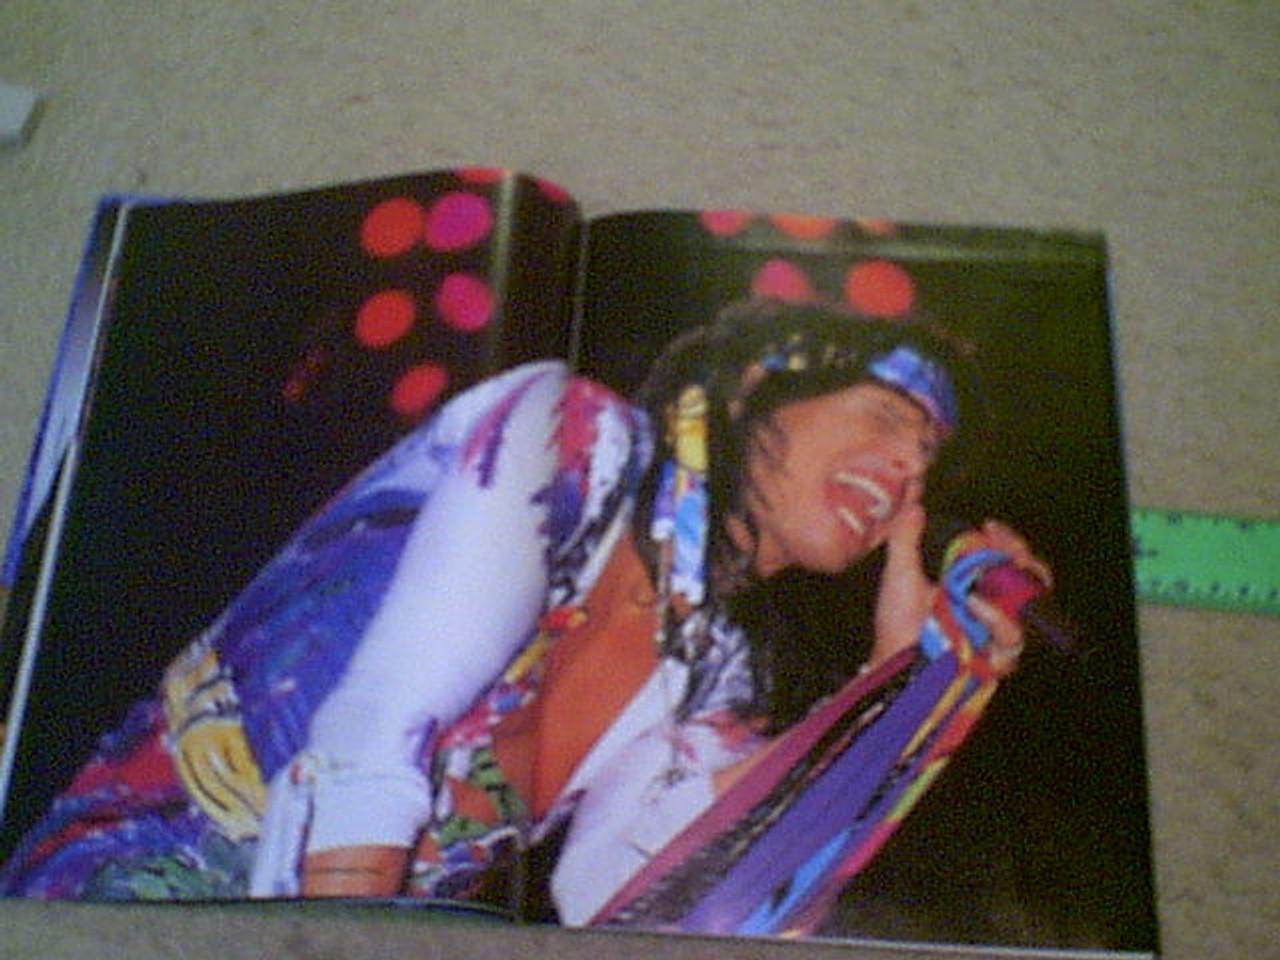 Aerosmith 1988 Magazine Signed Steve Tyler Joe Perry Tom Hamilton Autograph Color Photos With Color Poster